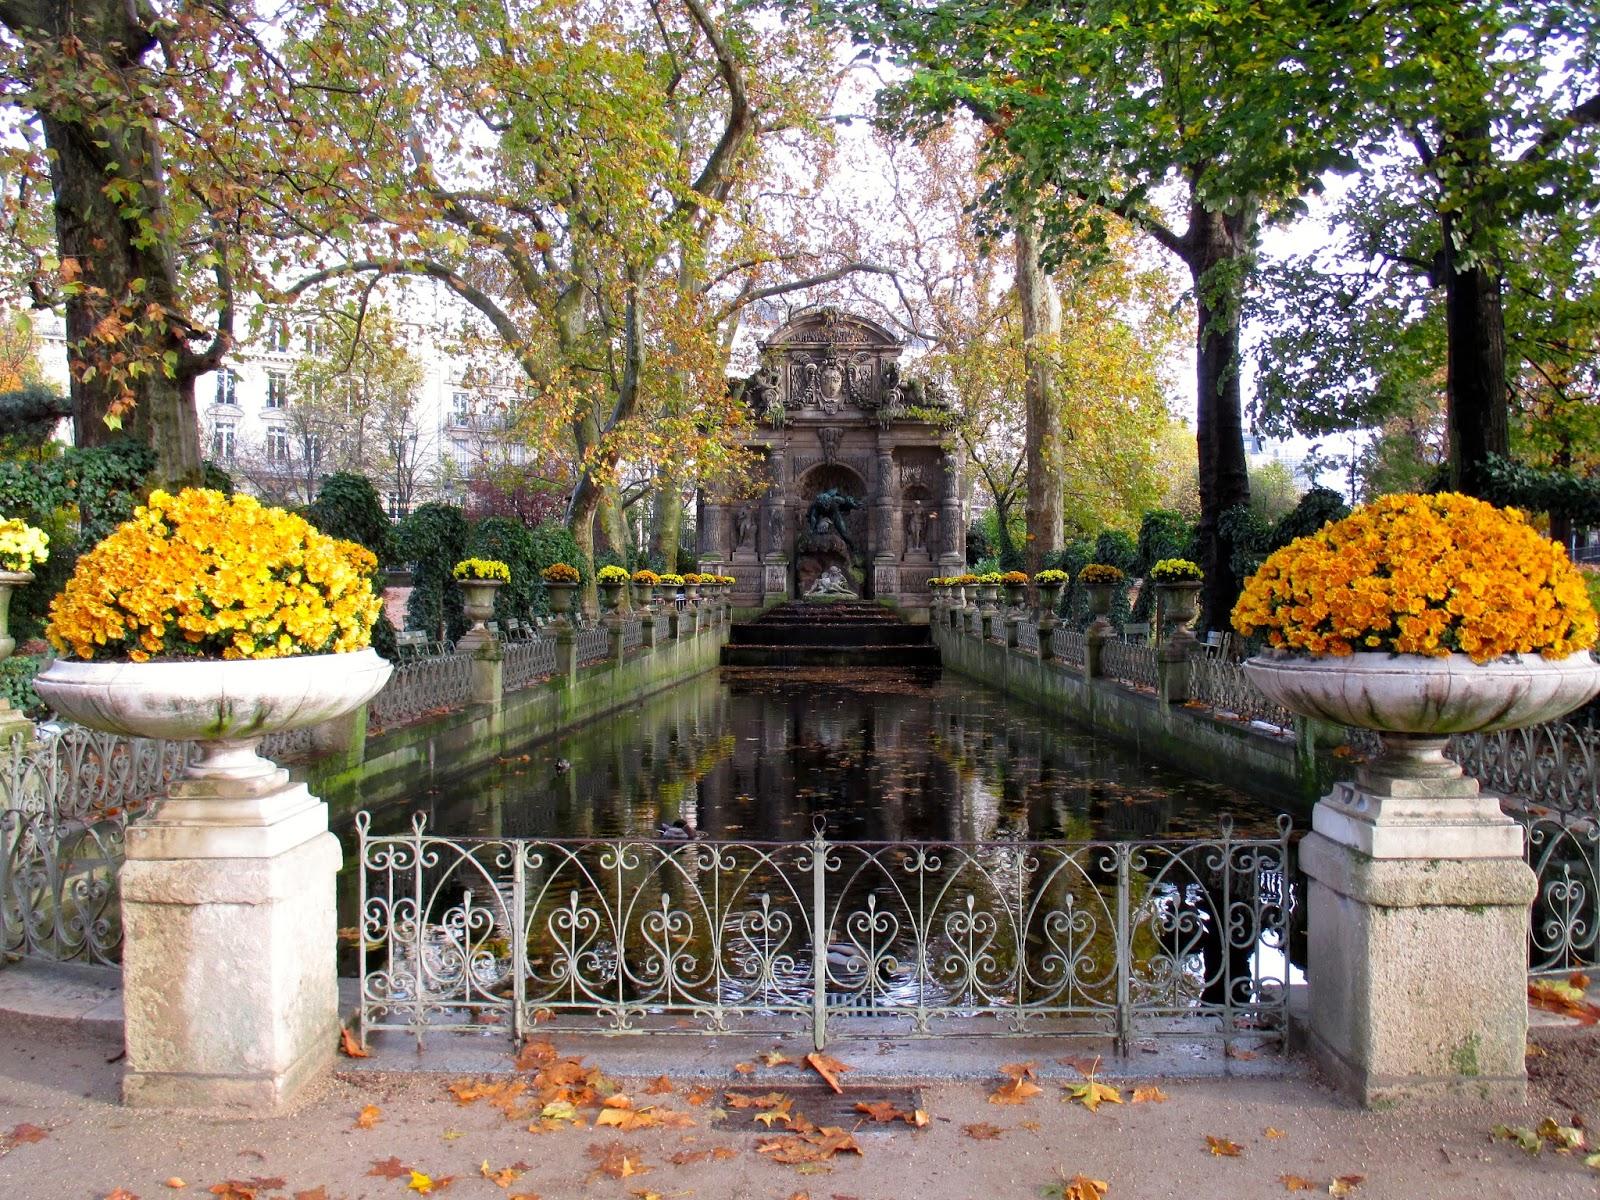 Une petite folie jardin du luxembourg - Jardin du luxembourg enfant ...